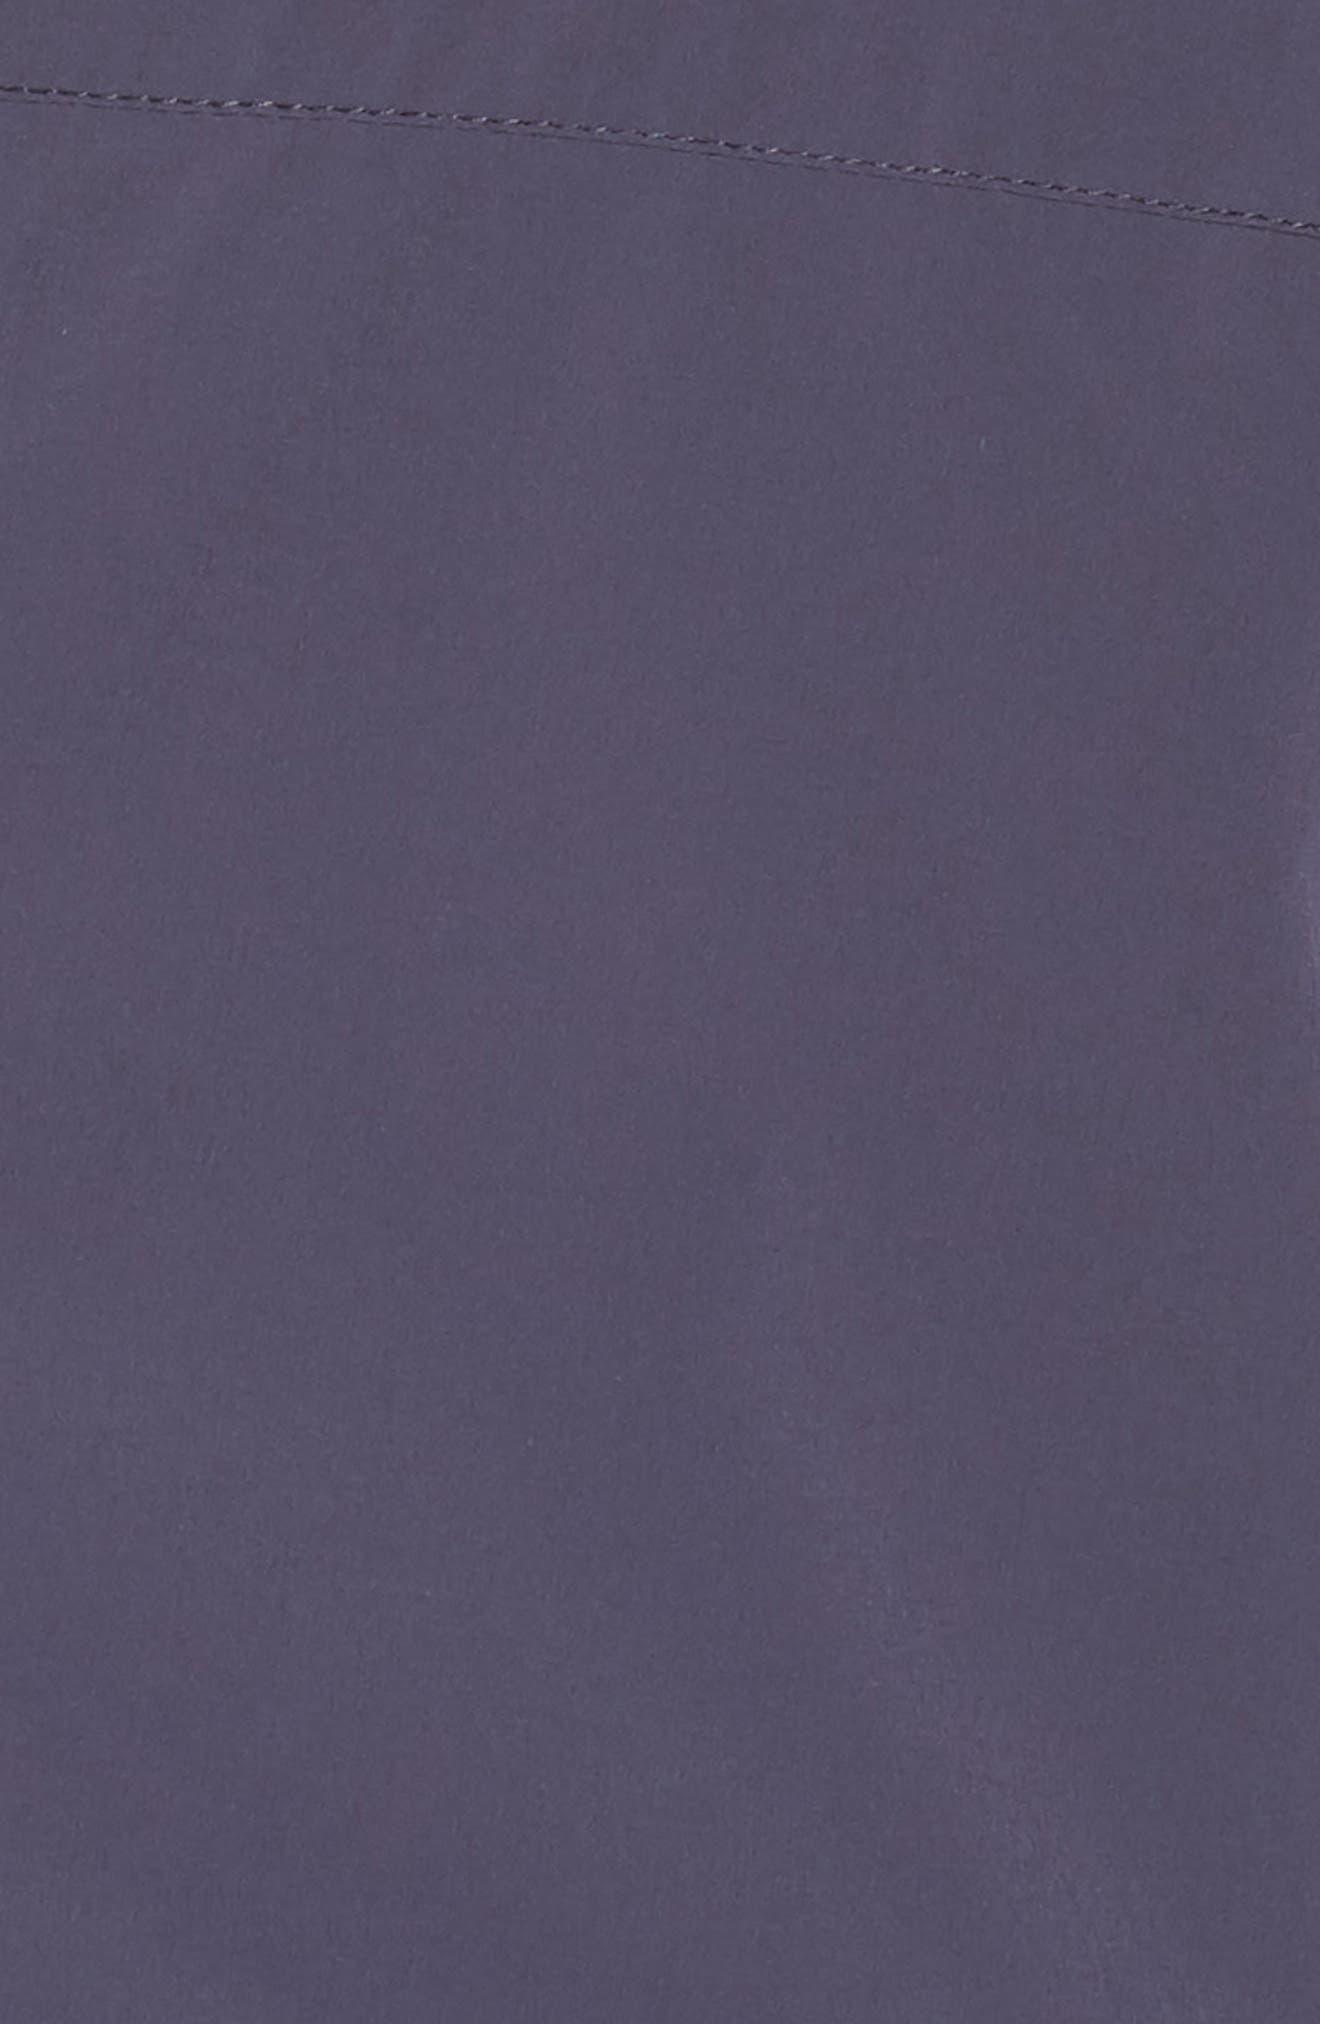 NIKE,                             Swift Run Jacket,                             Alternate thumbnail 6, color,                             081